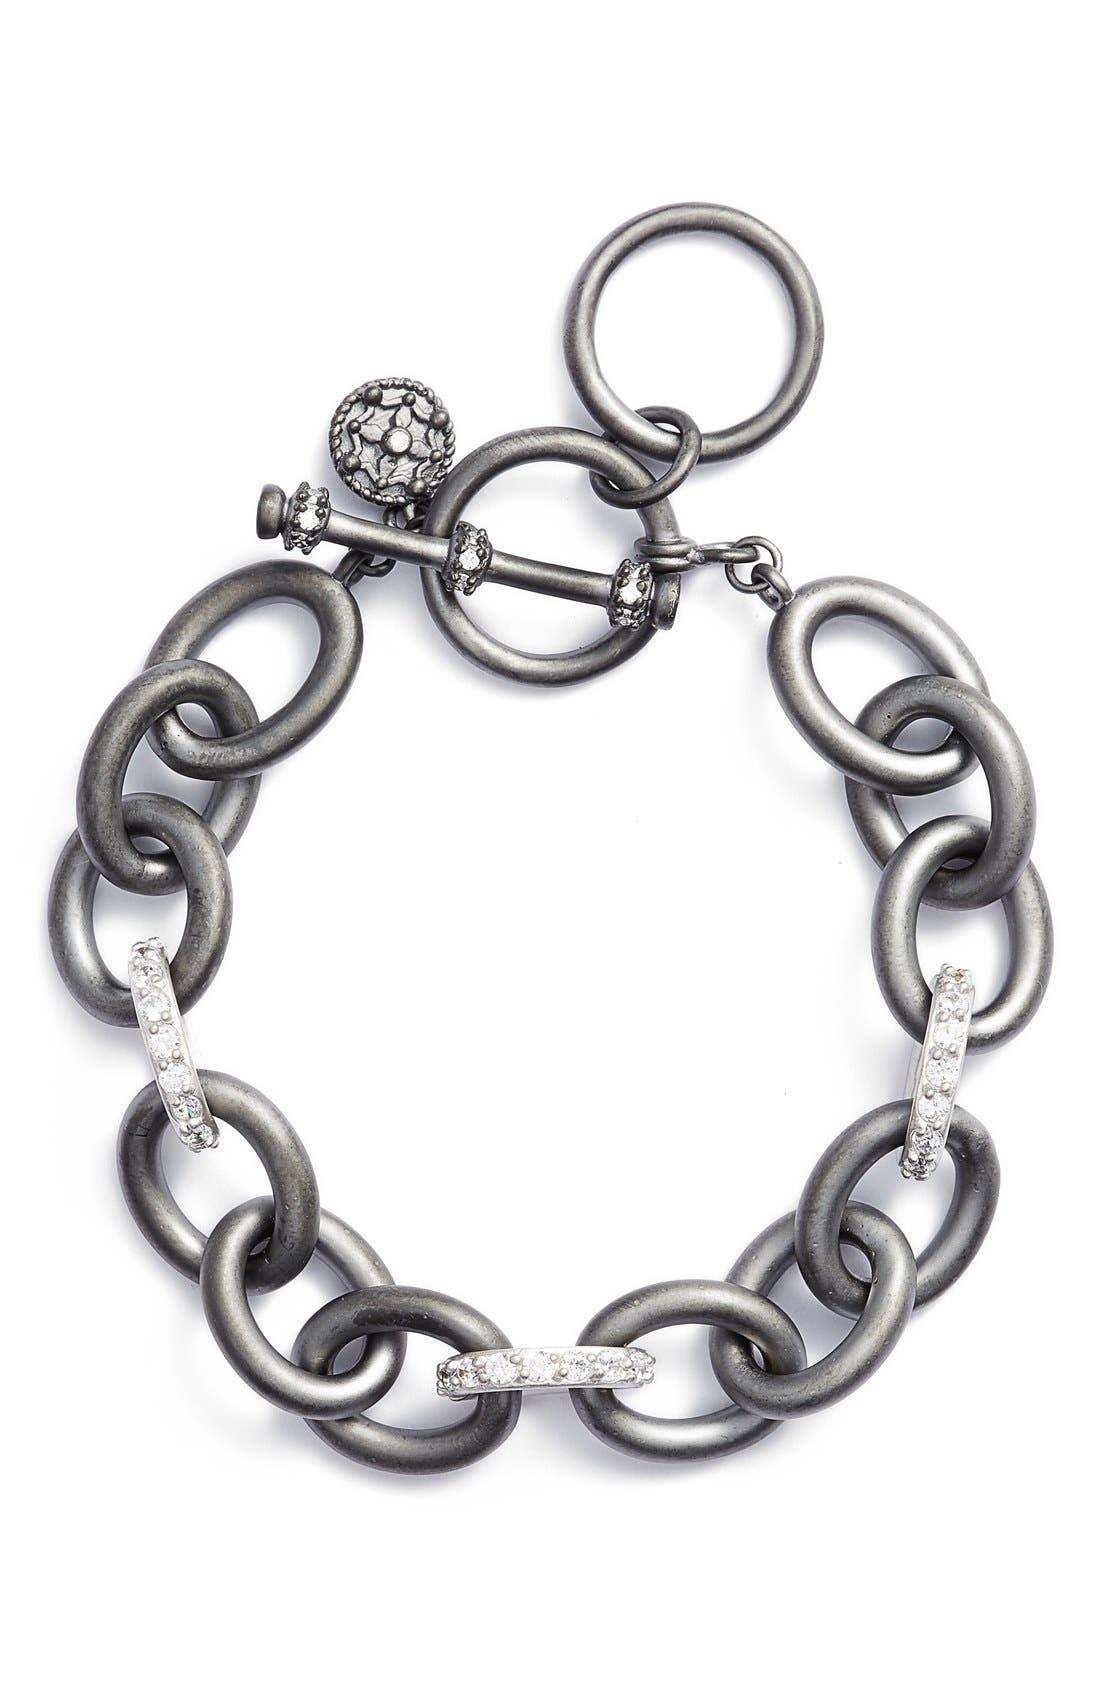 FREIDA ROTHMAN Contemporary Deco Heavy Chain Bracelet